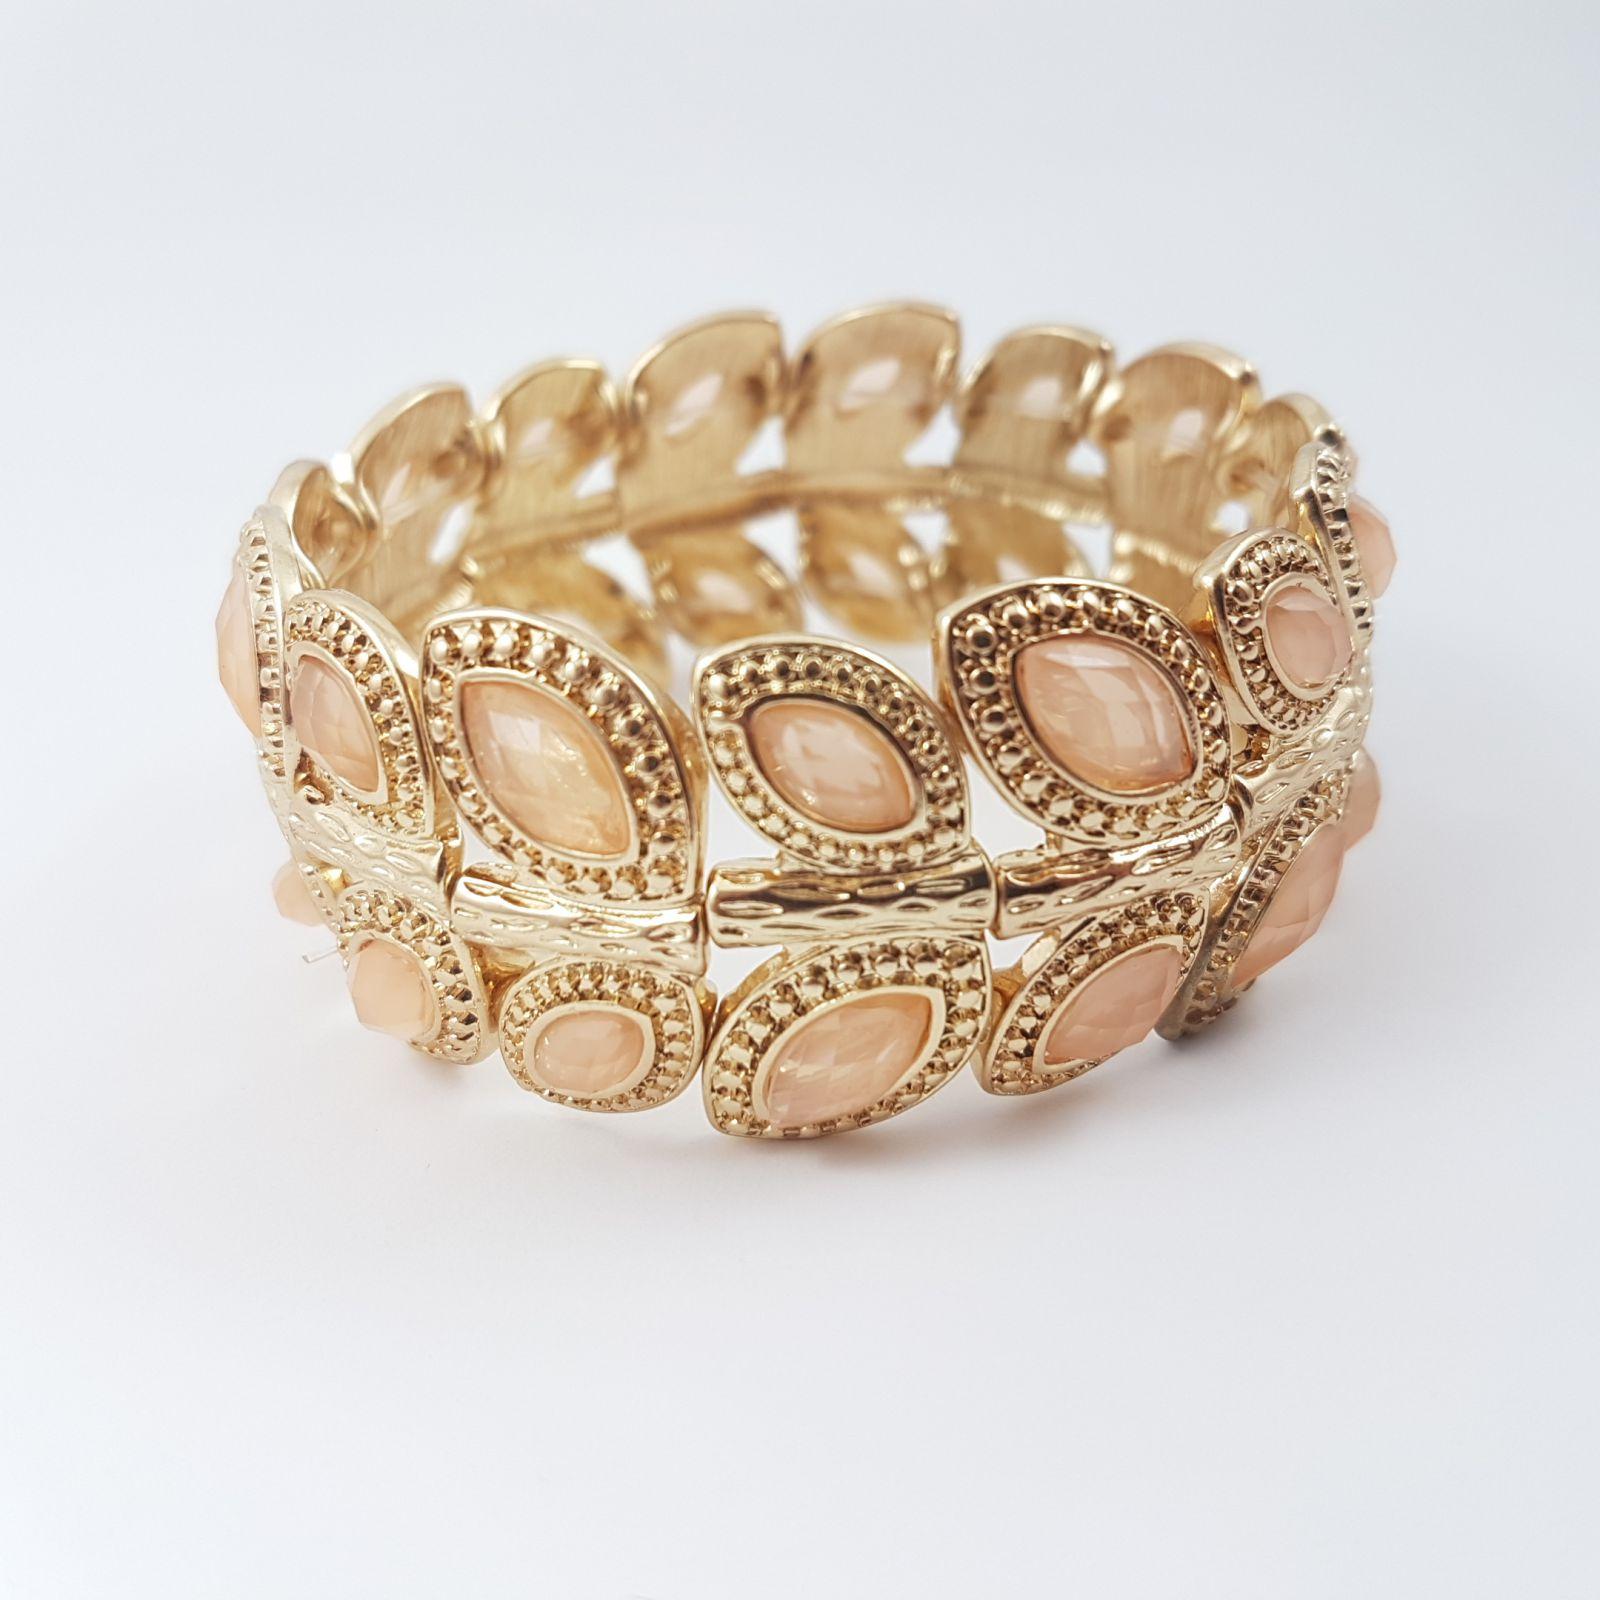 Zlatavý náramek s béžovými kamínky GIIL